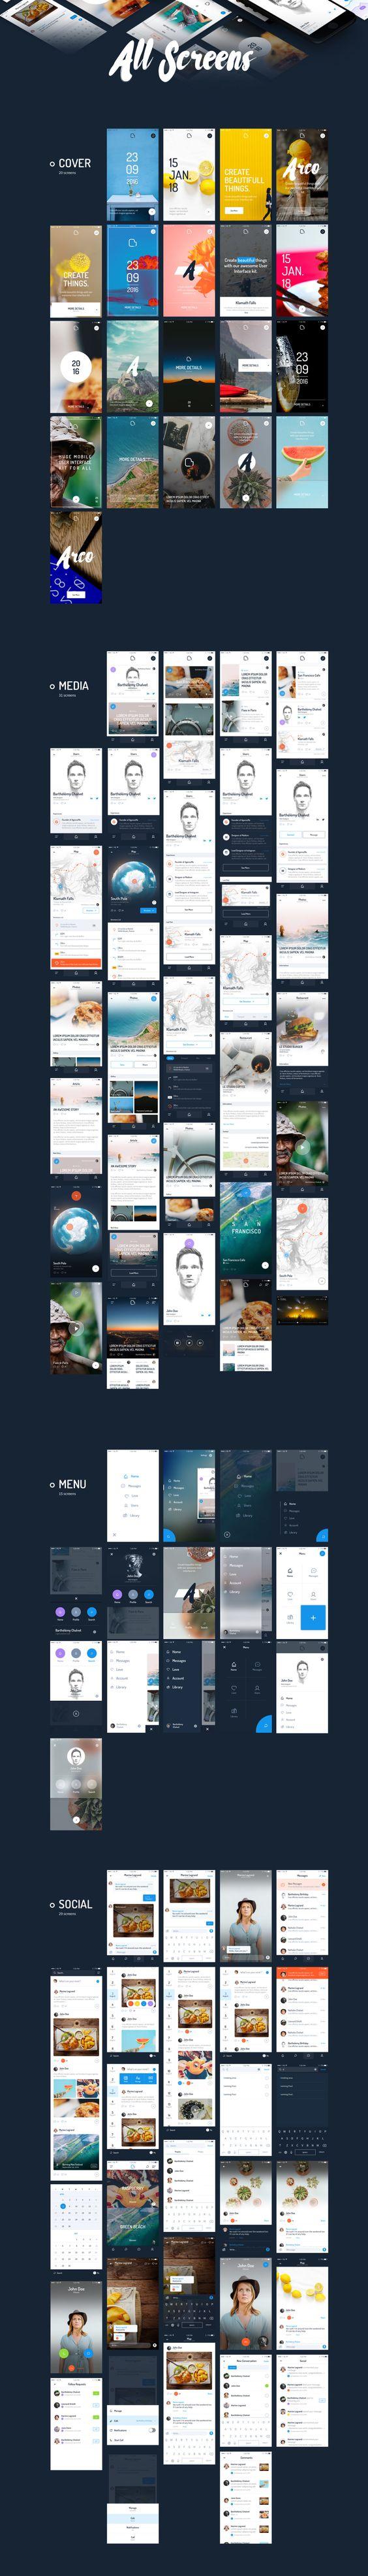 Arco - Mobile UI Kit by MarketMe on @creativemarket